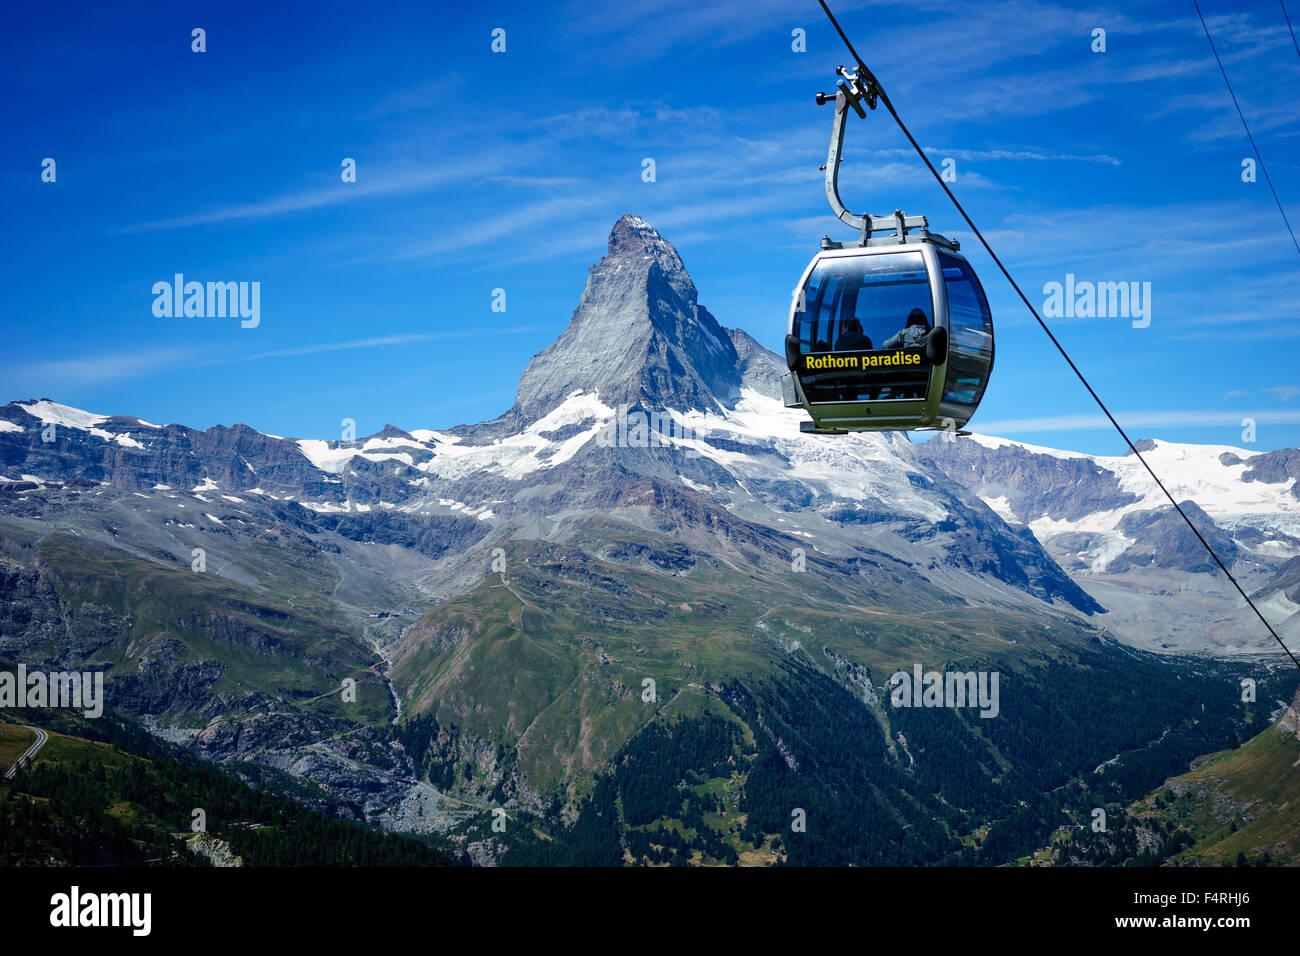 A cable car soars past Matterhorn peak. July, 2015. Matterhorn, Switzerland. Stock Photo